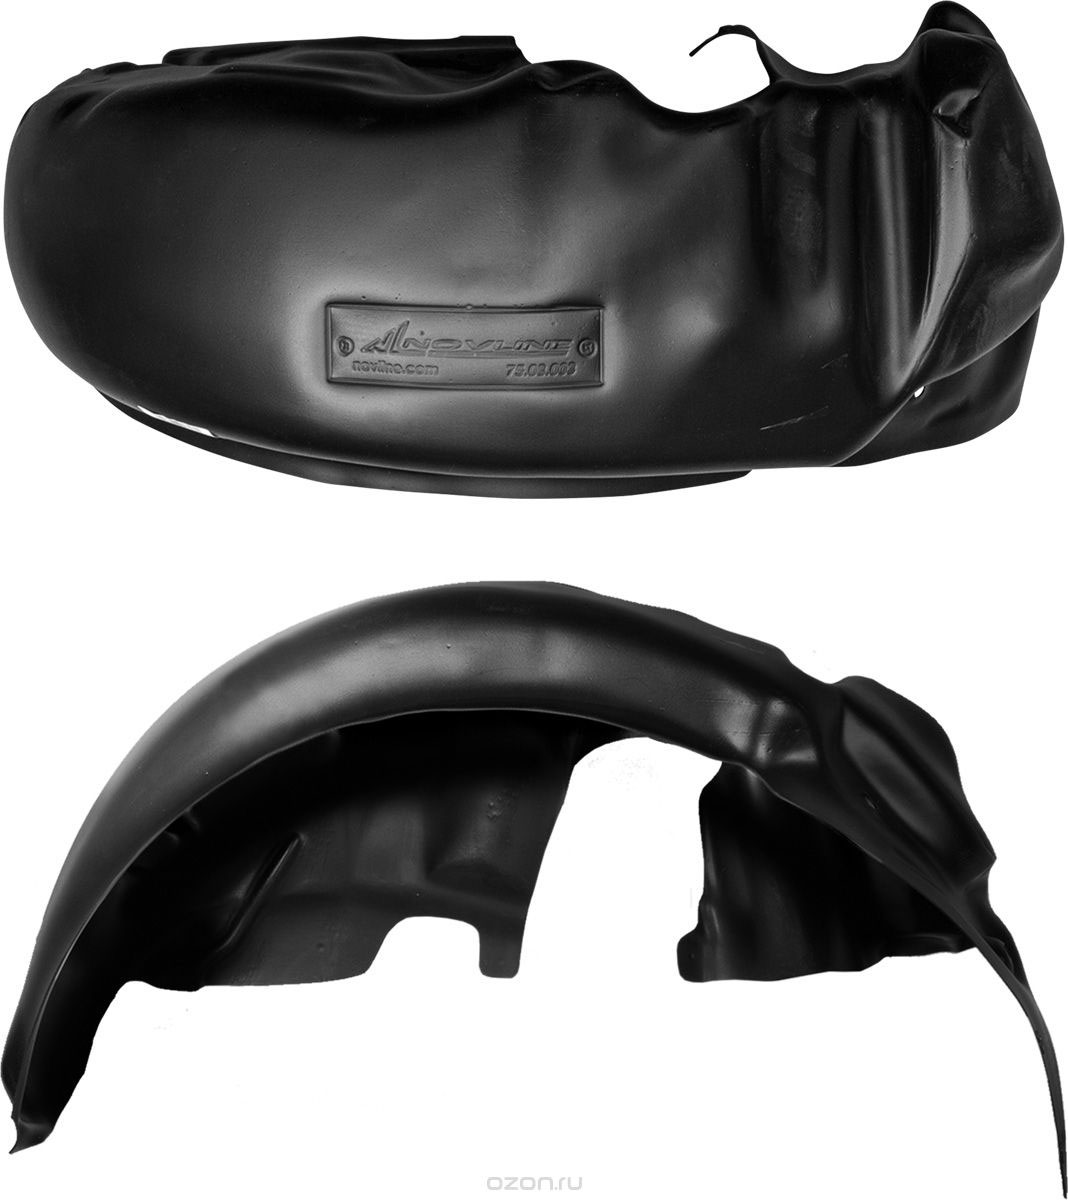 Подкрылок Novline-Autofamily, для Ford Mondeo, 2007-2014, седан, задний правый дефлекторы окон autofamily sim ford mondeo 2007 2010 комплект 4шт nld sfomon0732